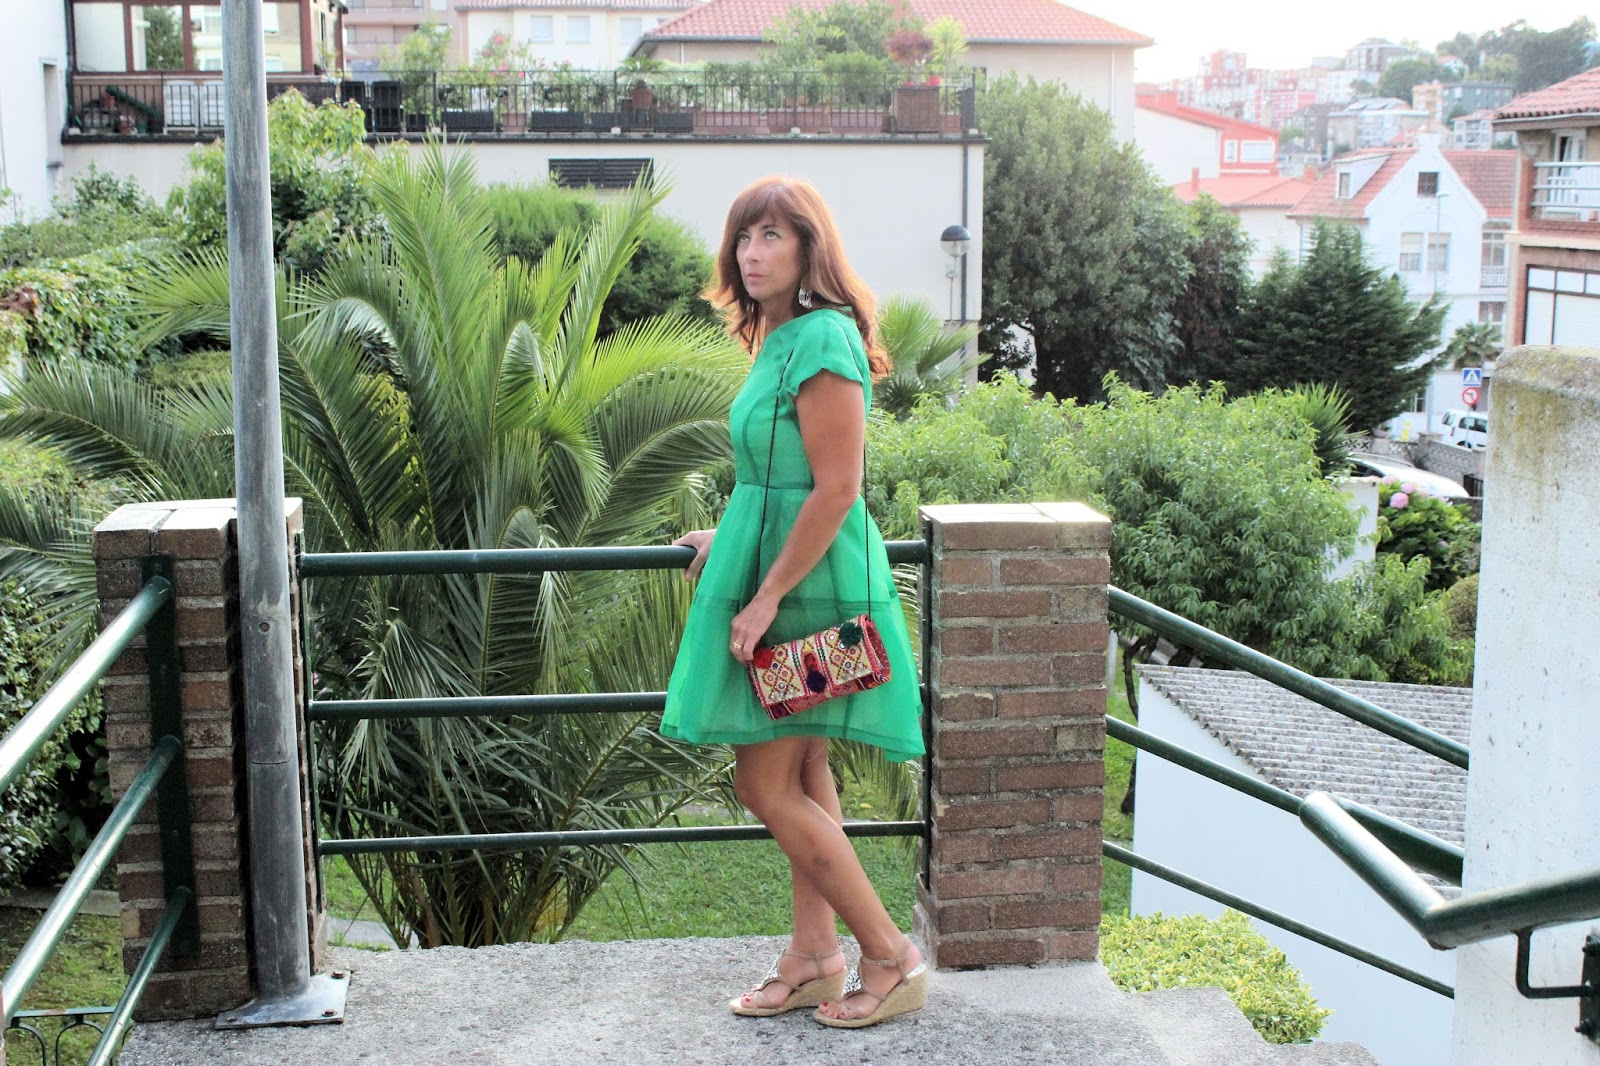 Br jula de estilo mis looks vestido verde teria yabar - Brujula de estilo ...